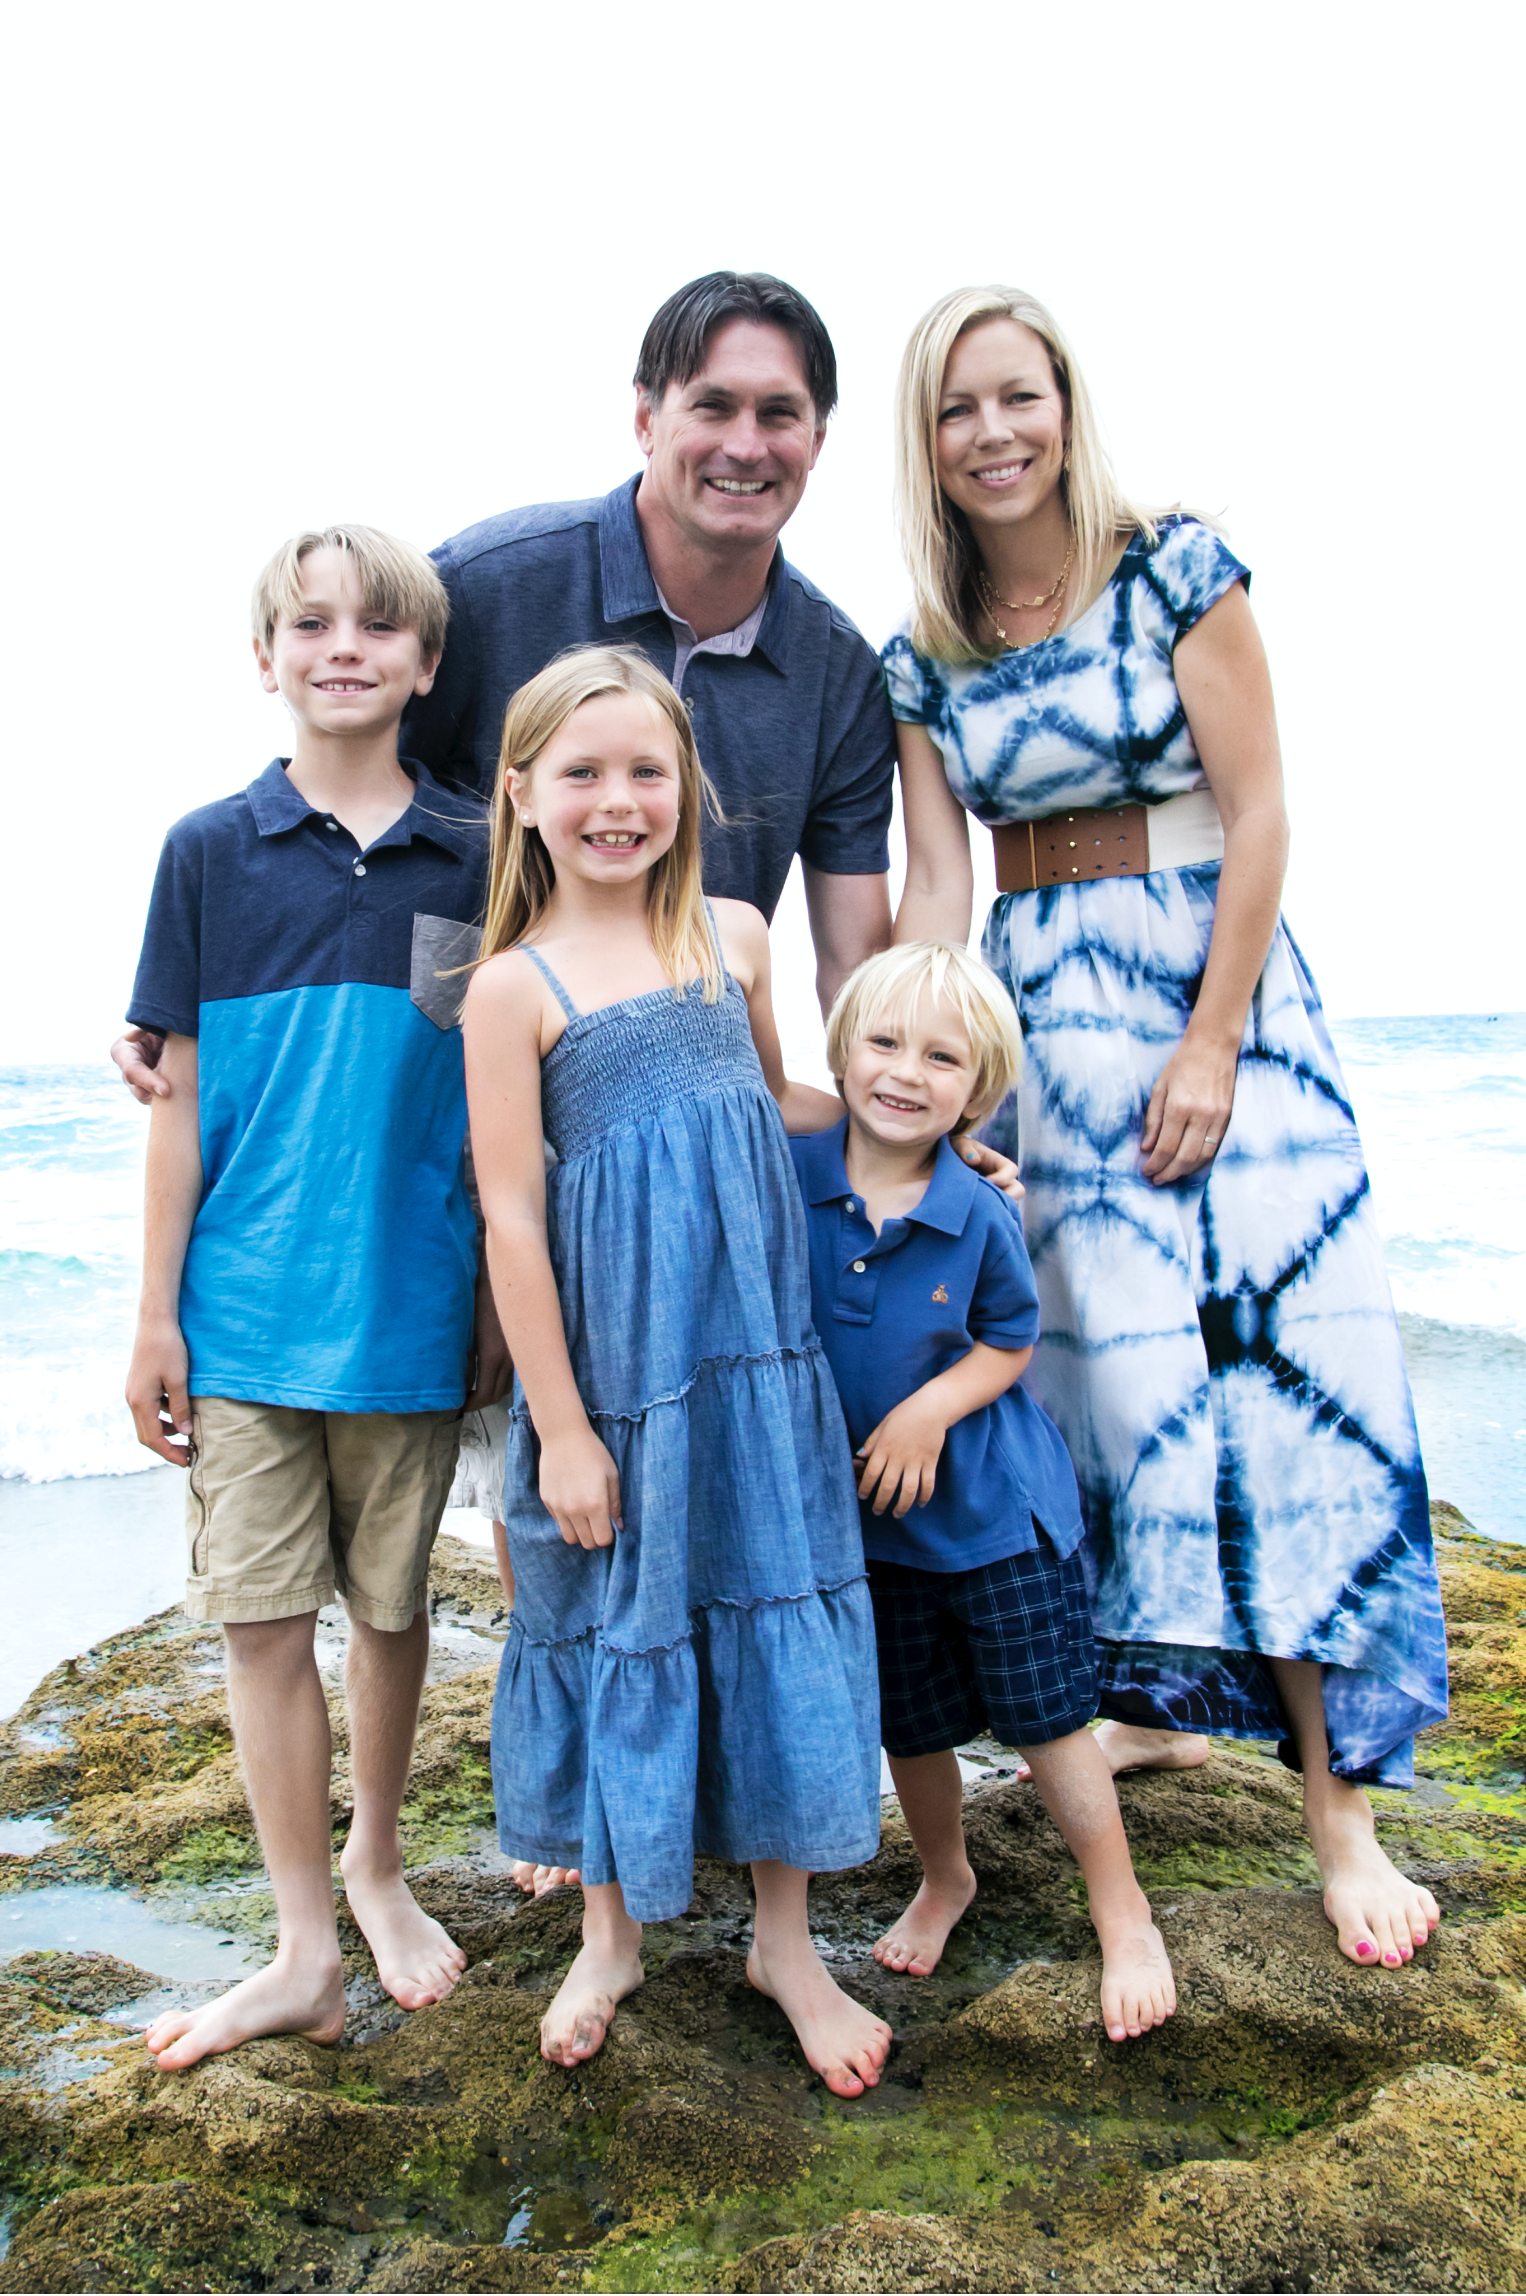 DAHL FAMILY, cardiff state beach, 2016